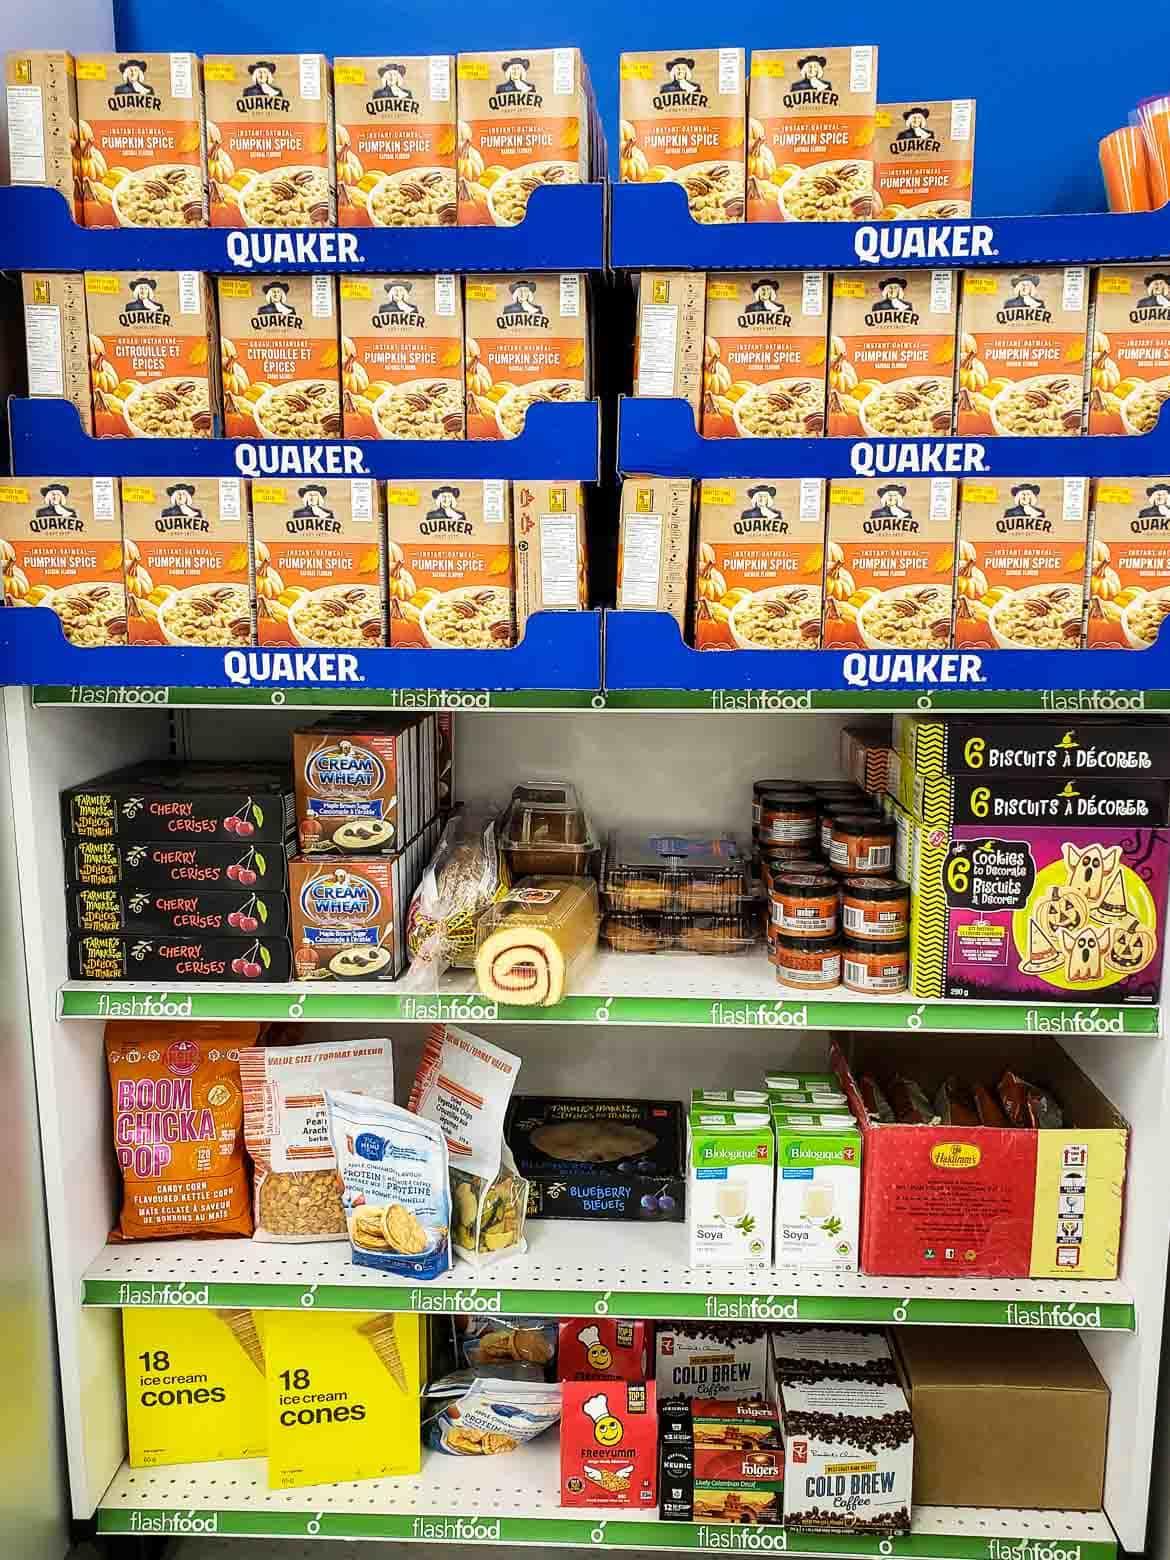 Flashfood dry goods pantry